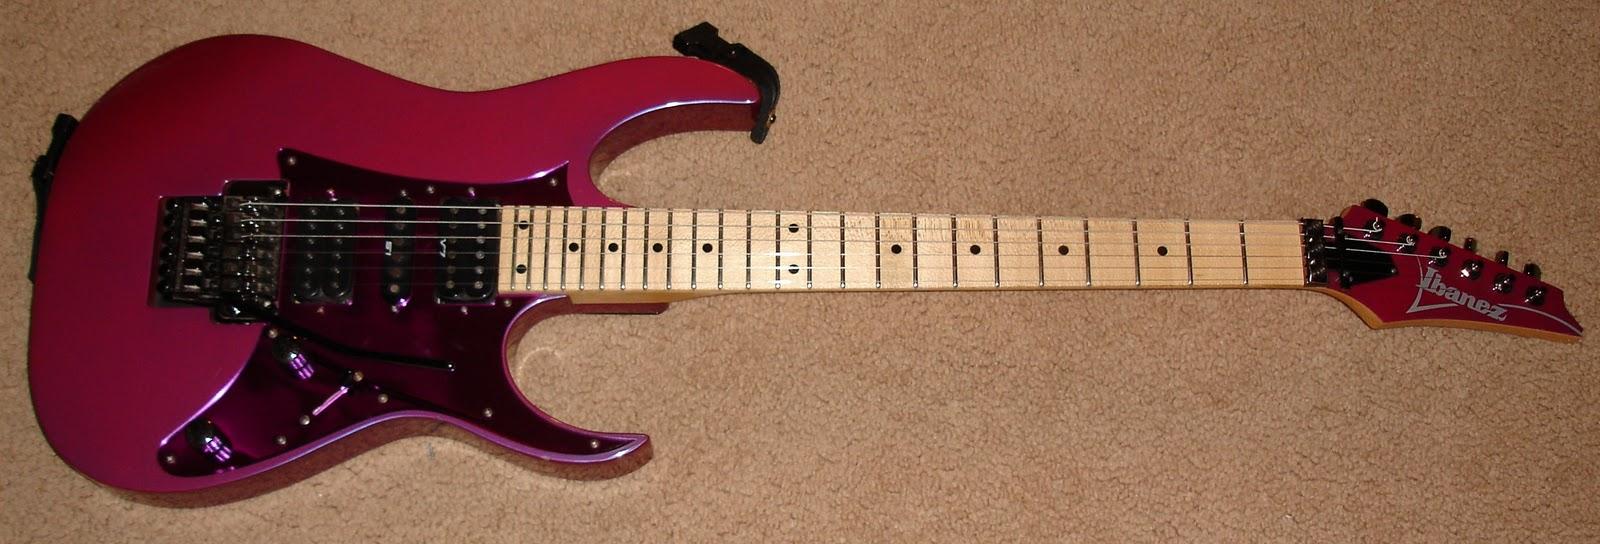 Ibanez EDGE II Floyd Rose Tremolo Bridge Original Black String Saddle